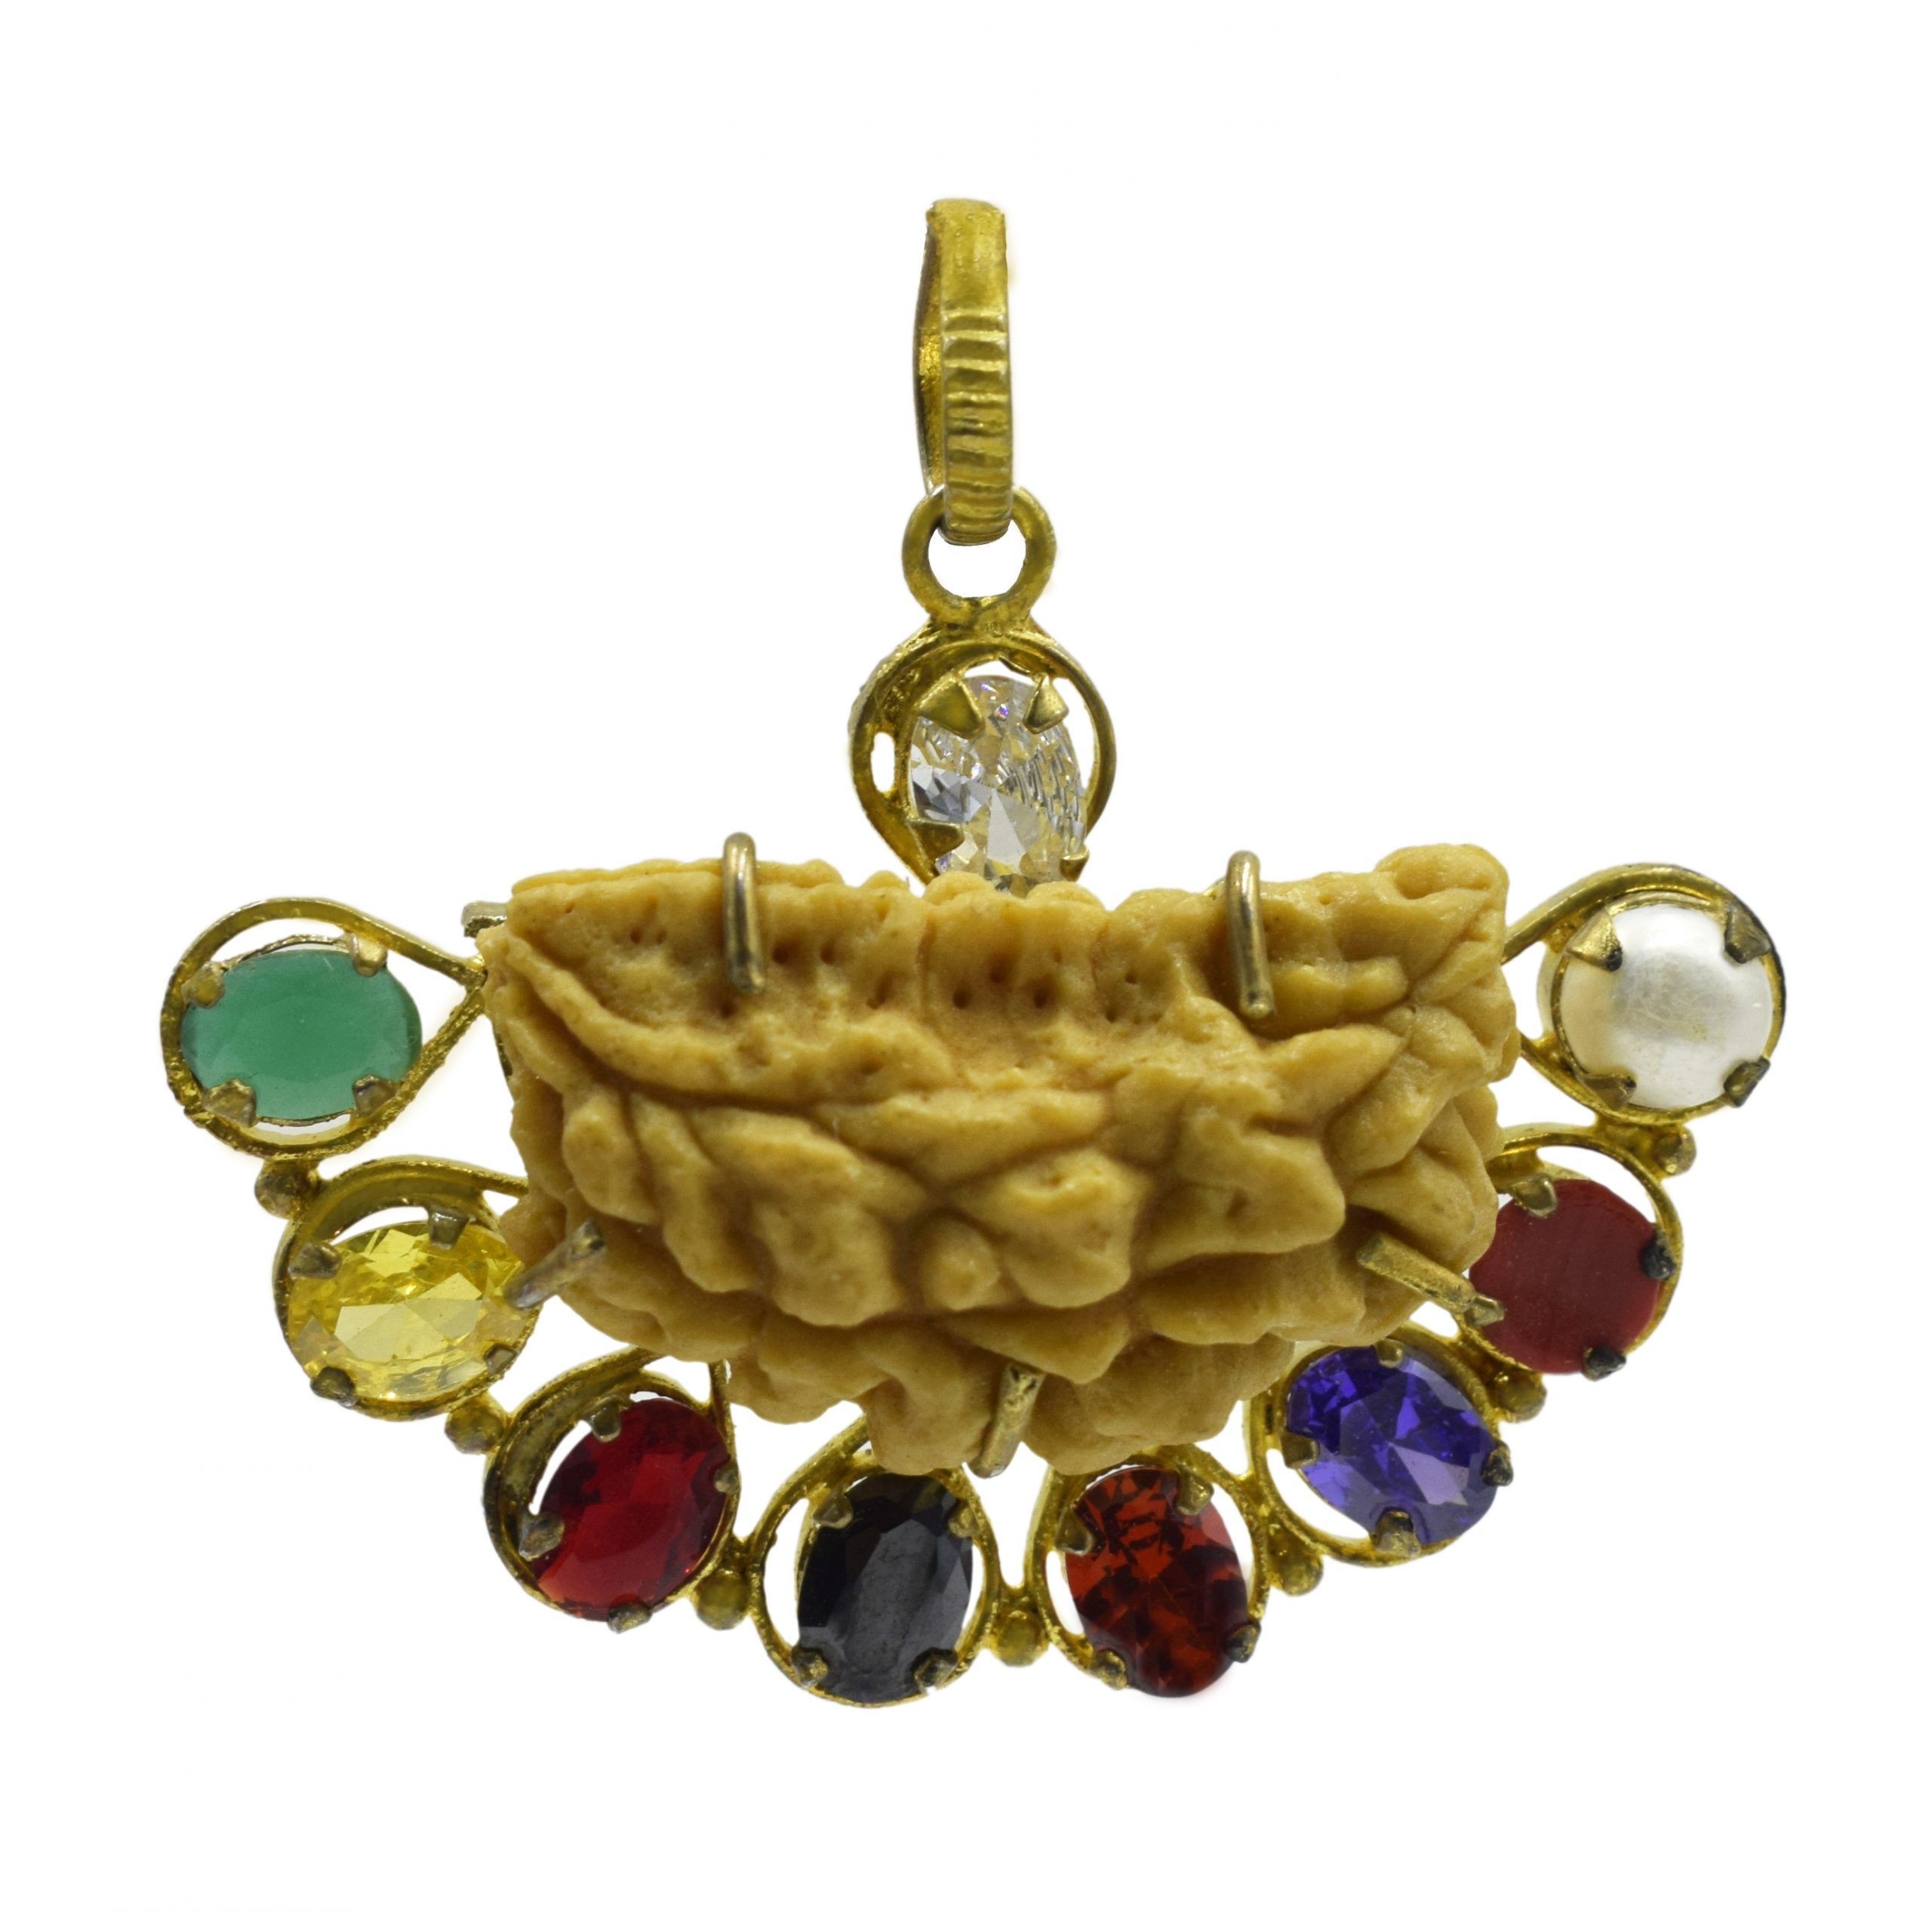 Navgrah Rudraksha Pendant (नवग्रह रुद्राक्ष पेंडंट)